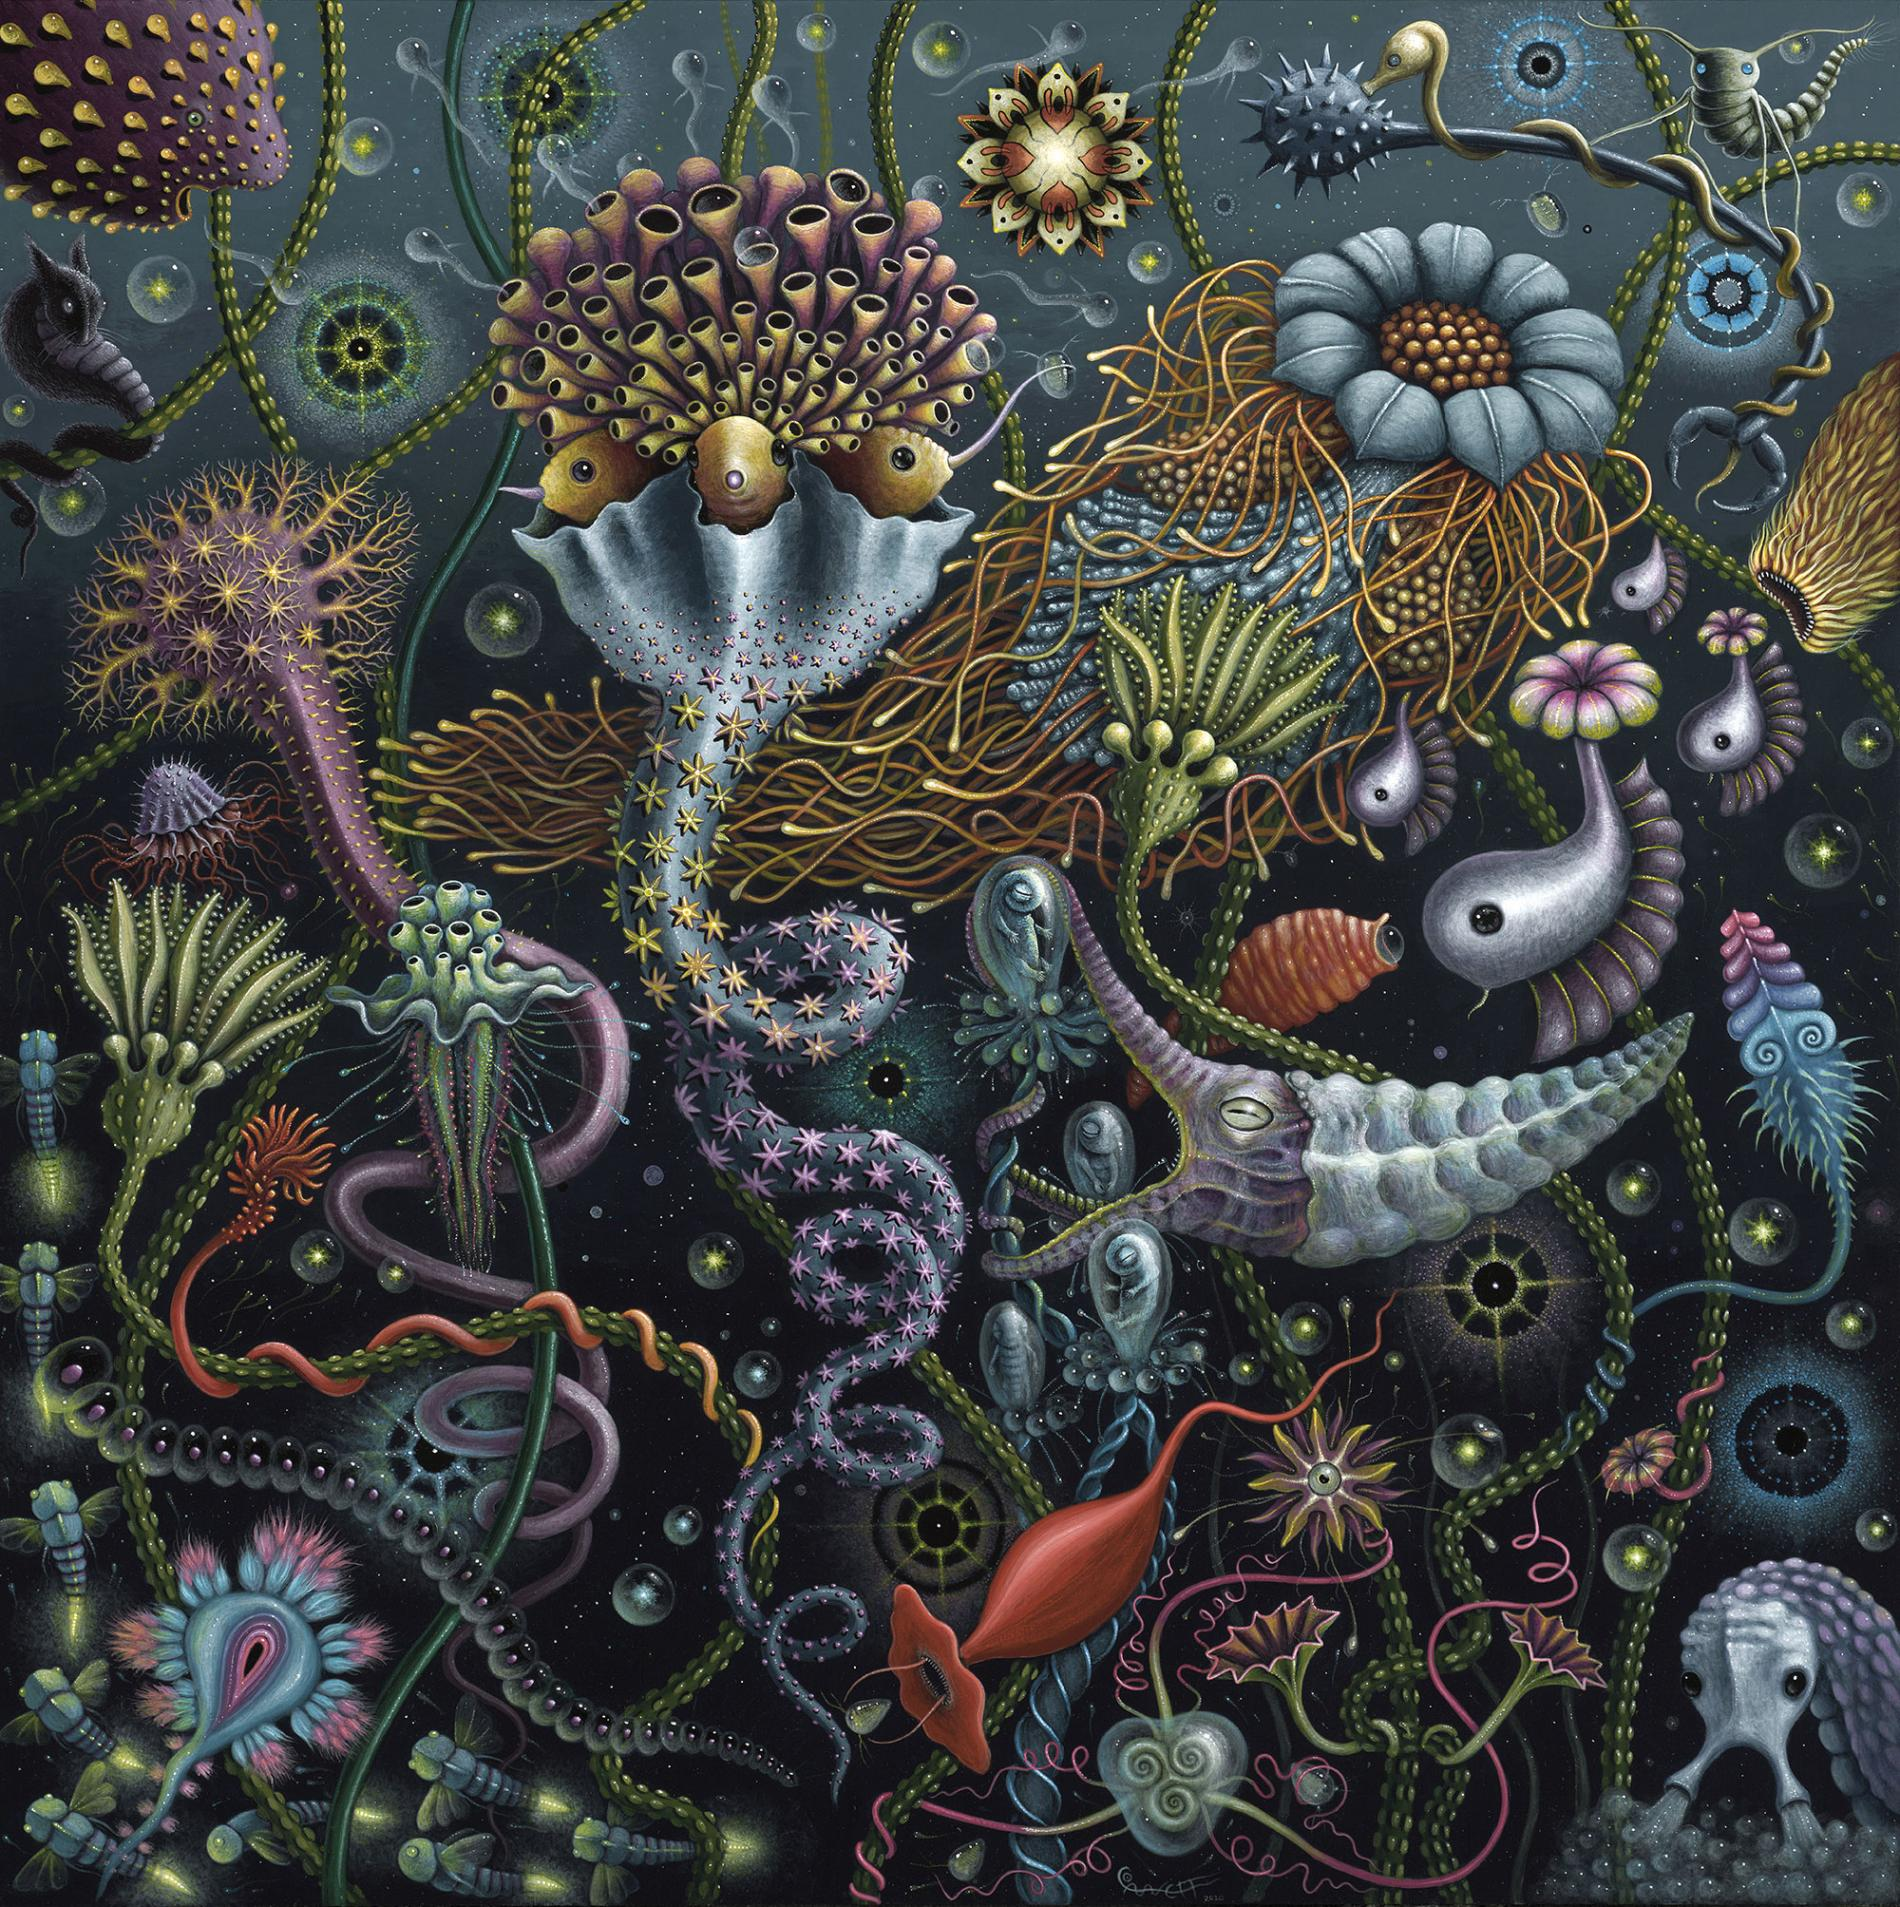 Robert Steven Connett mico universos Space Plankton 2